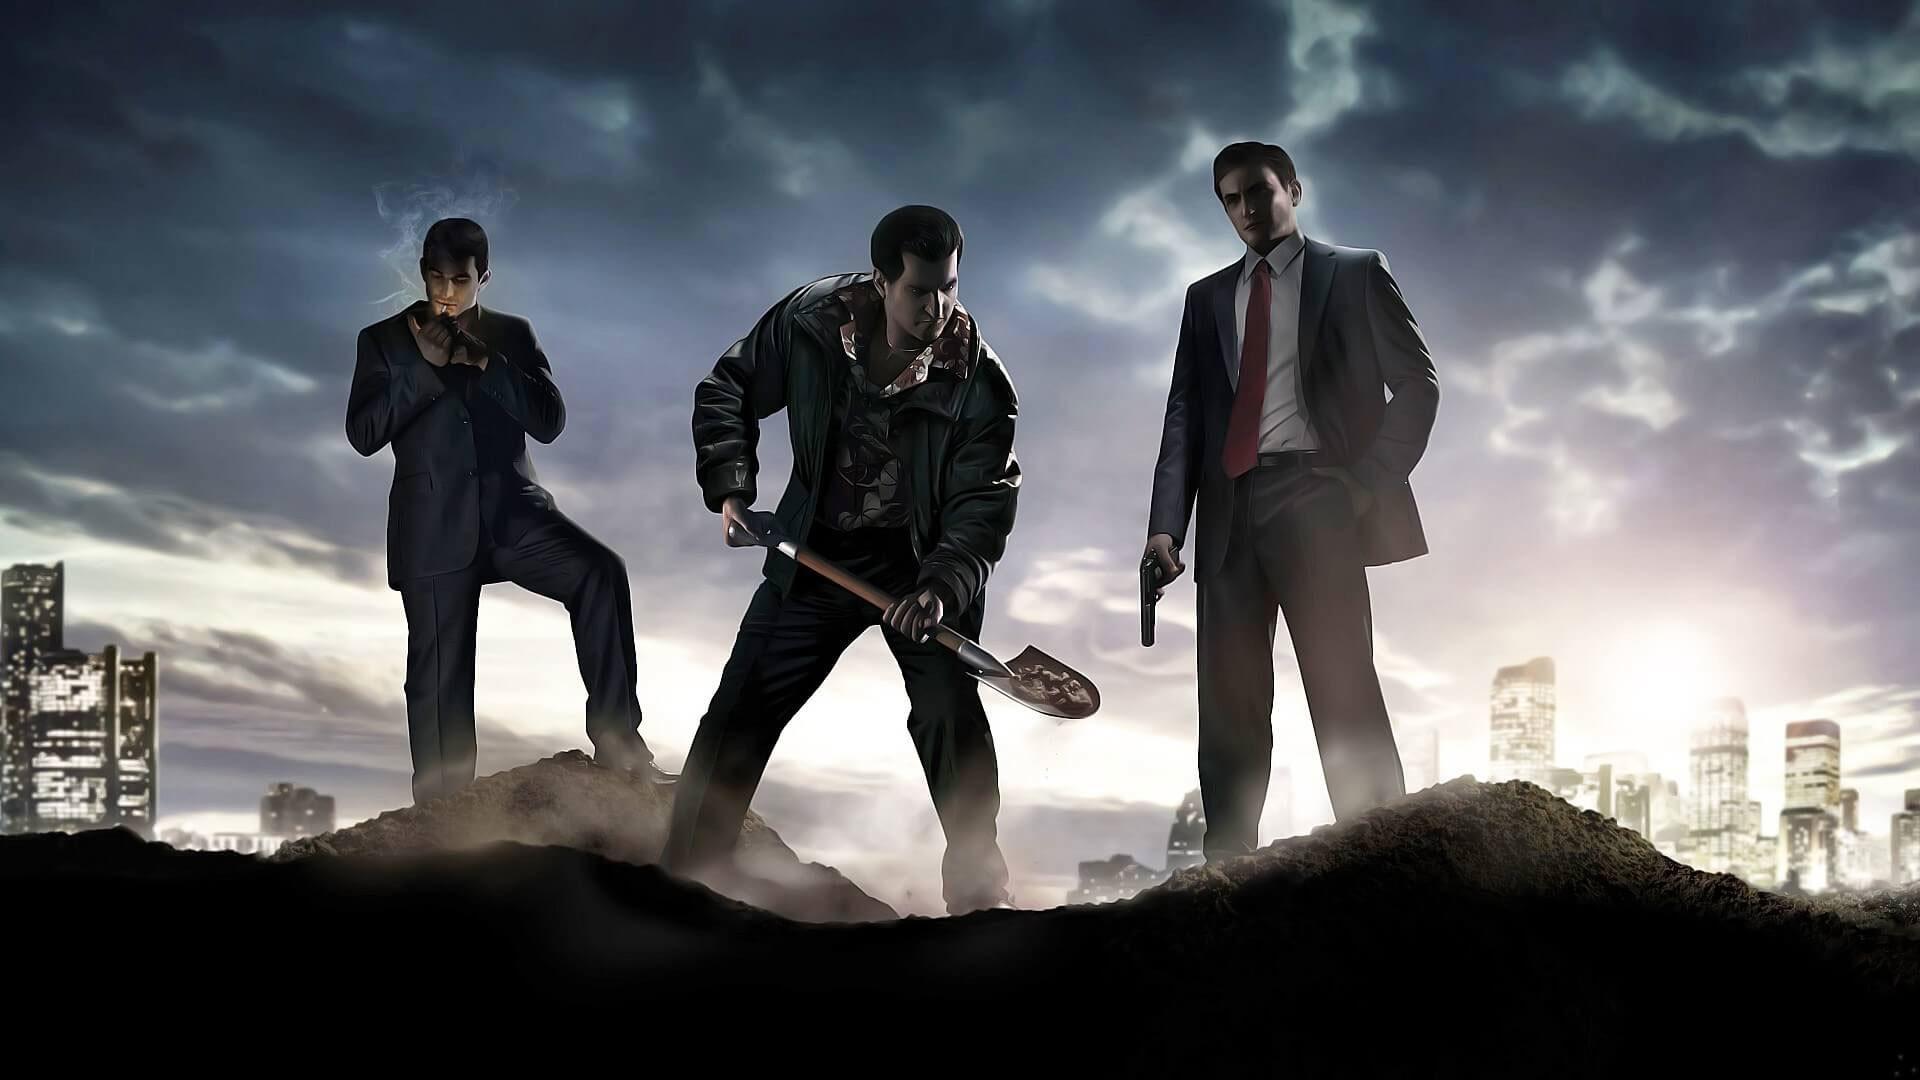 Mafia III 4K Wallpaper | Mafia III 1080p Wallpaper …